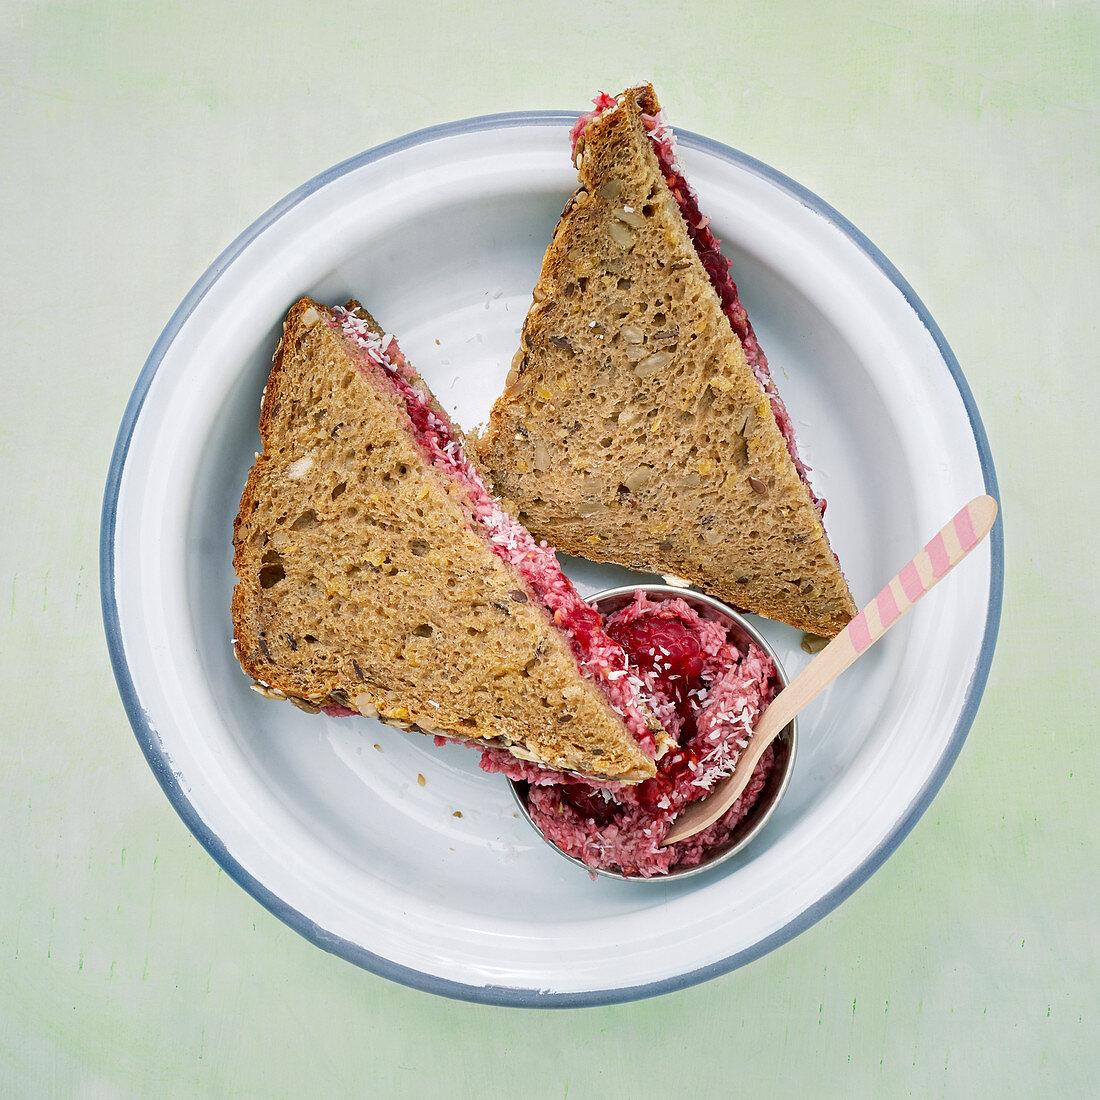 Raspberry and banana sandwiches